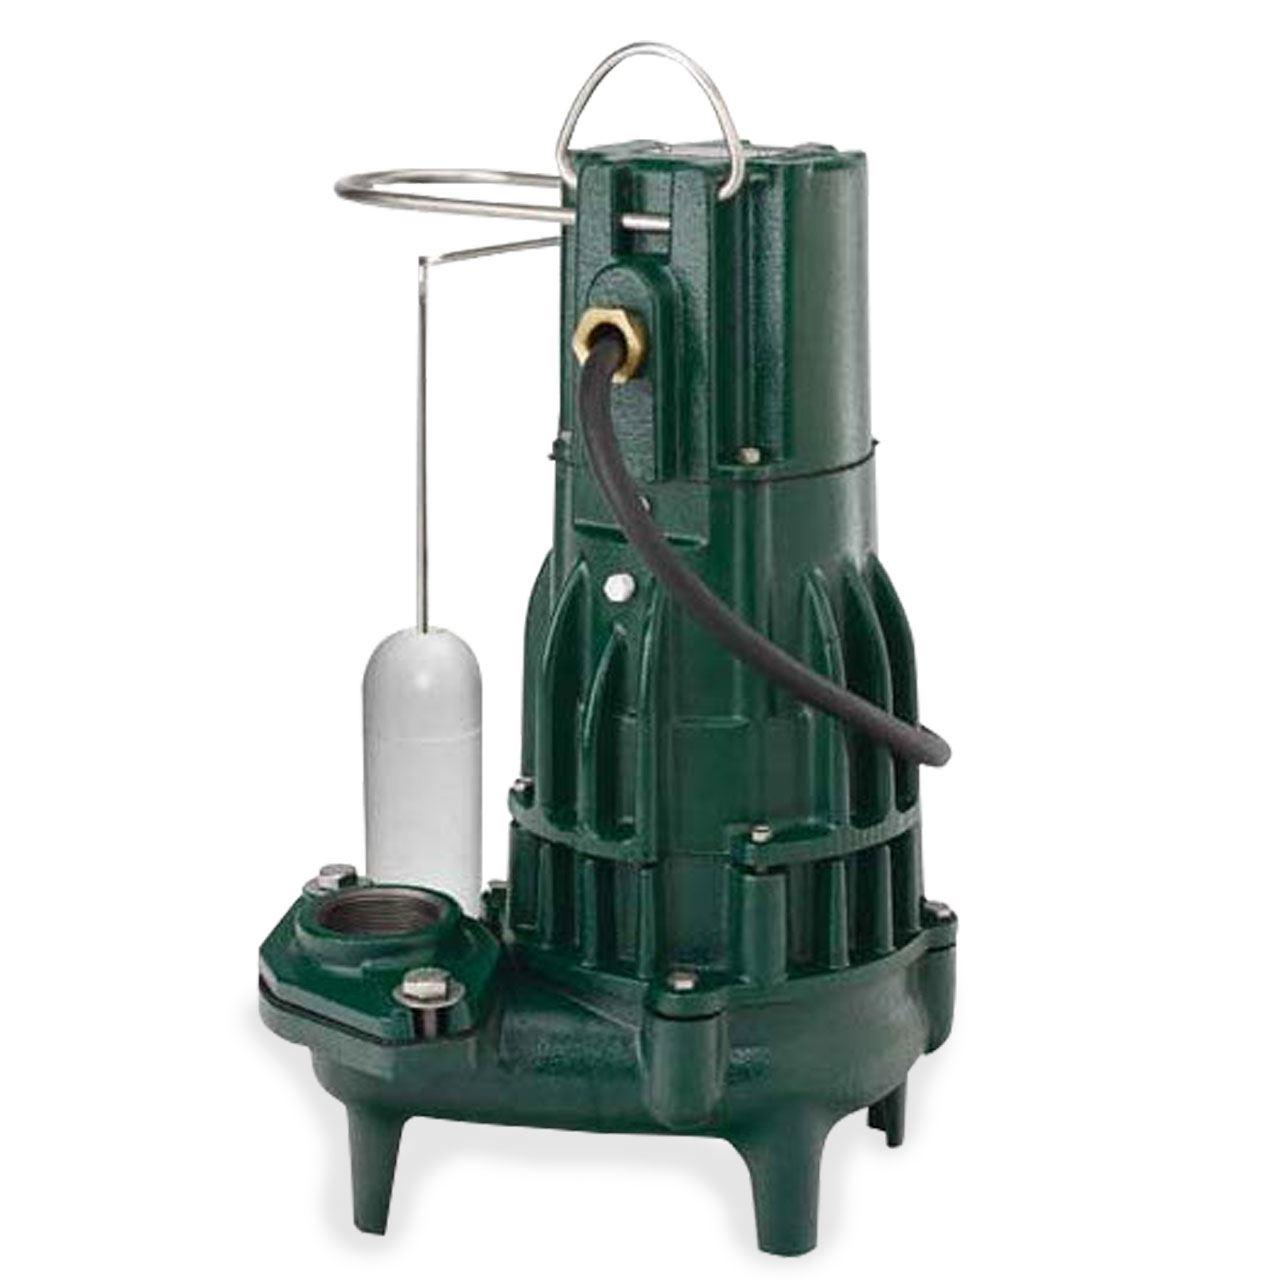 zlr29x000xa_001_wbg?bw=750&w=750&bh=750&h=750 zoeller zoeller 295 0003 model d295 high head sewage dewatering zoeller pump wiring diagram at readyjetset.co